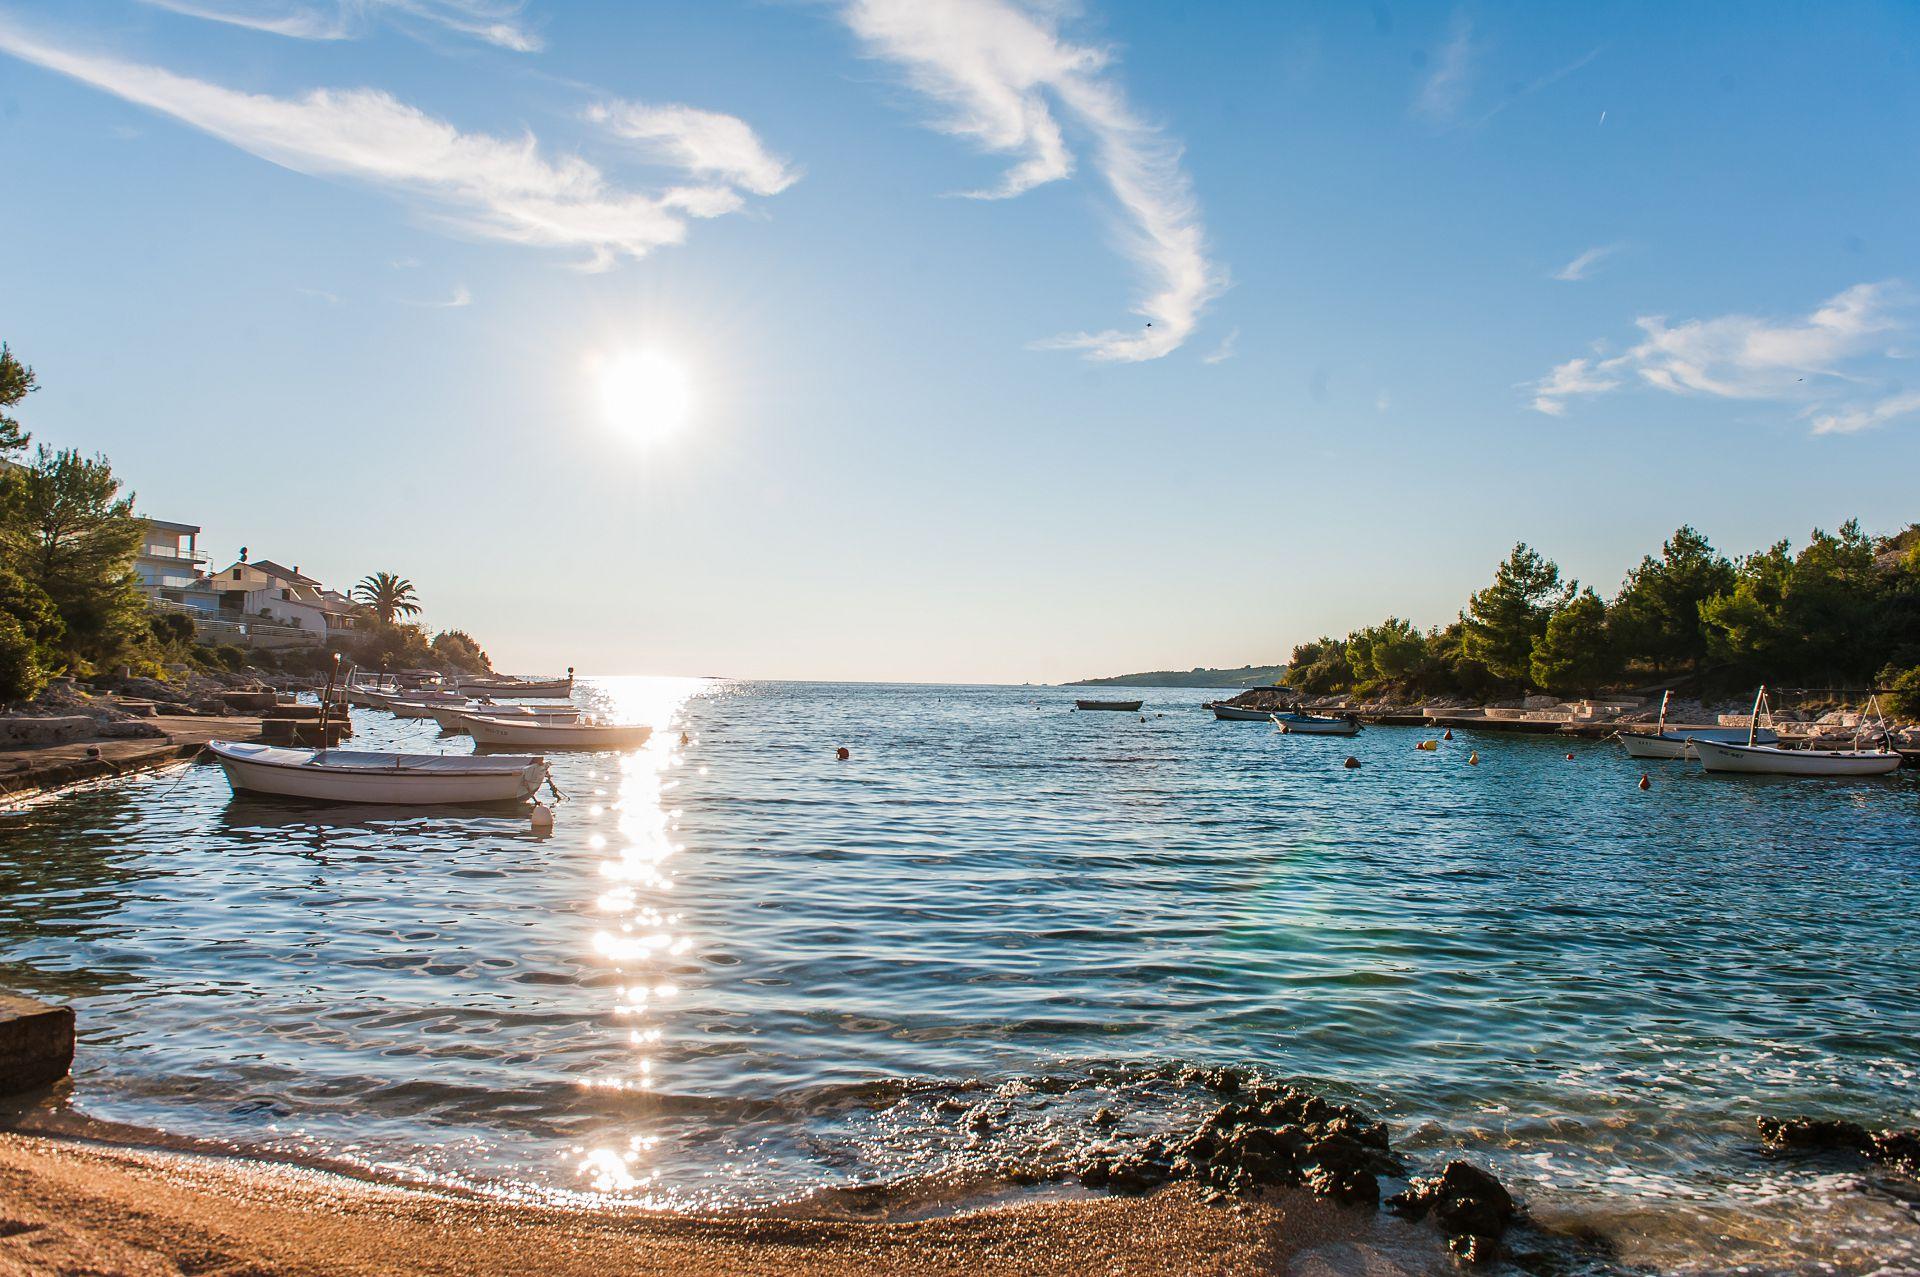 Ferienwohnung 01106ROGO A2(6+2) - Bucht Kanica (Rogoznica) (741933), Rogoznica, , Dalmatien, Kroatien, Bild 8